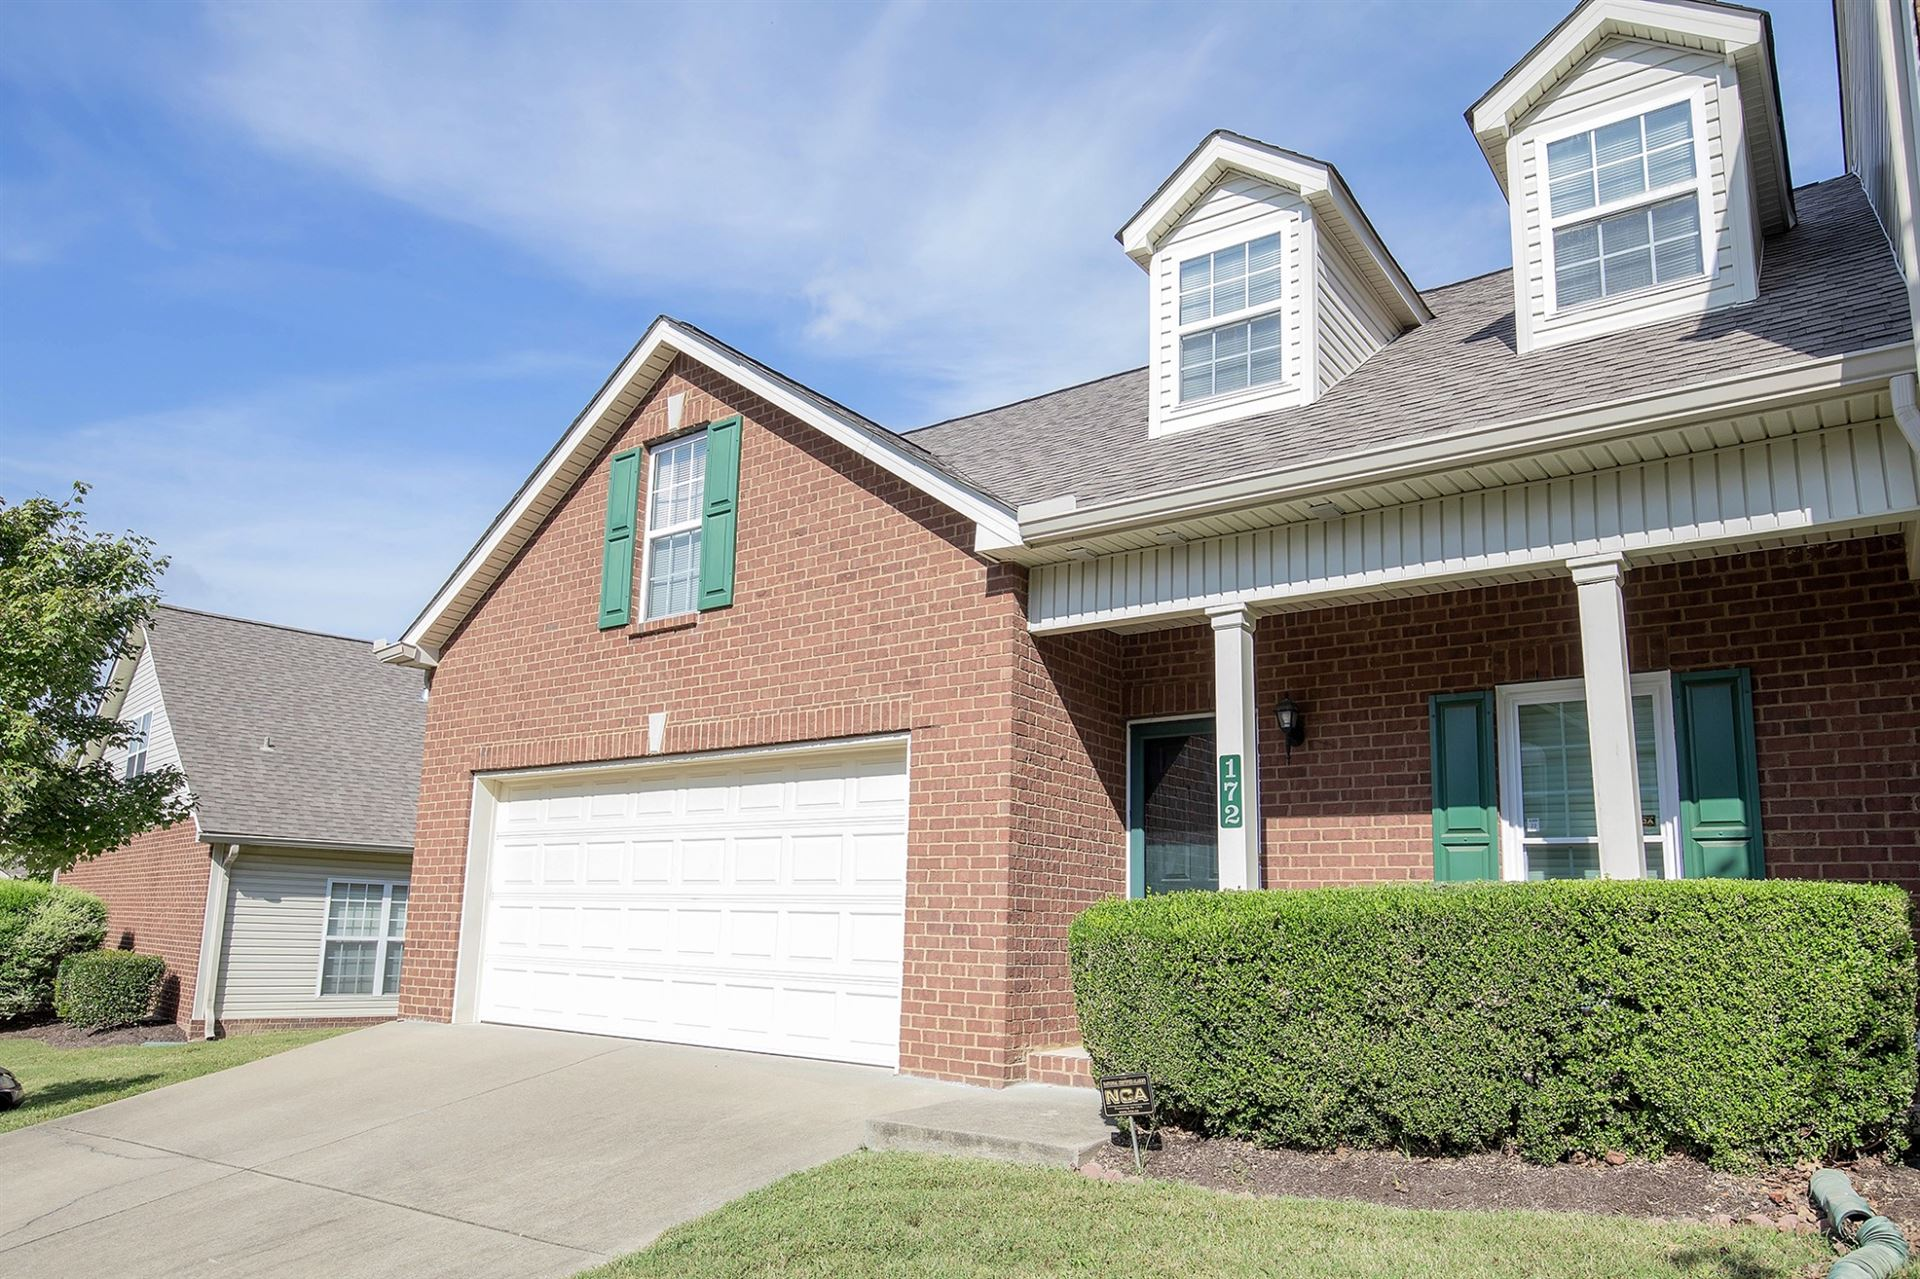 Photo of 172 Nashboro Grns, Nashville, TN 37217 (MLS # 2300599)